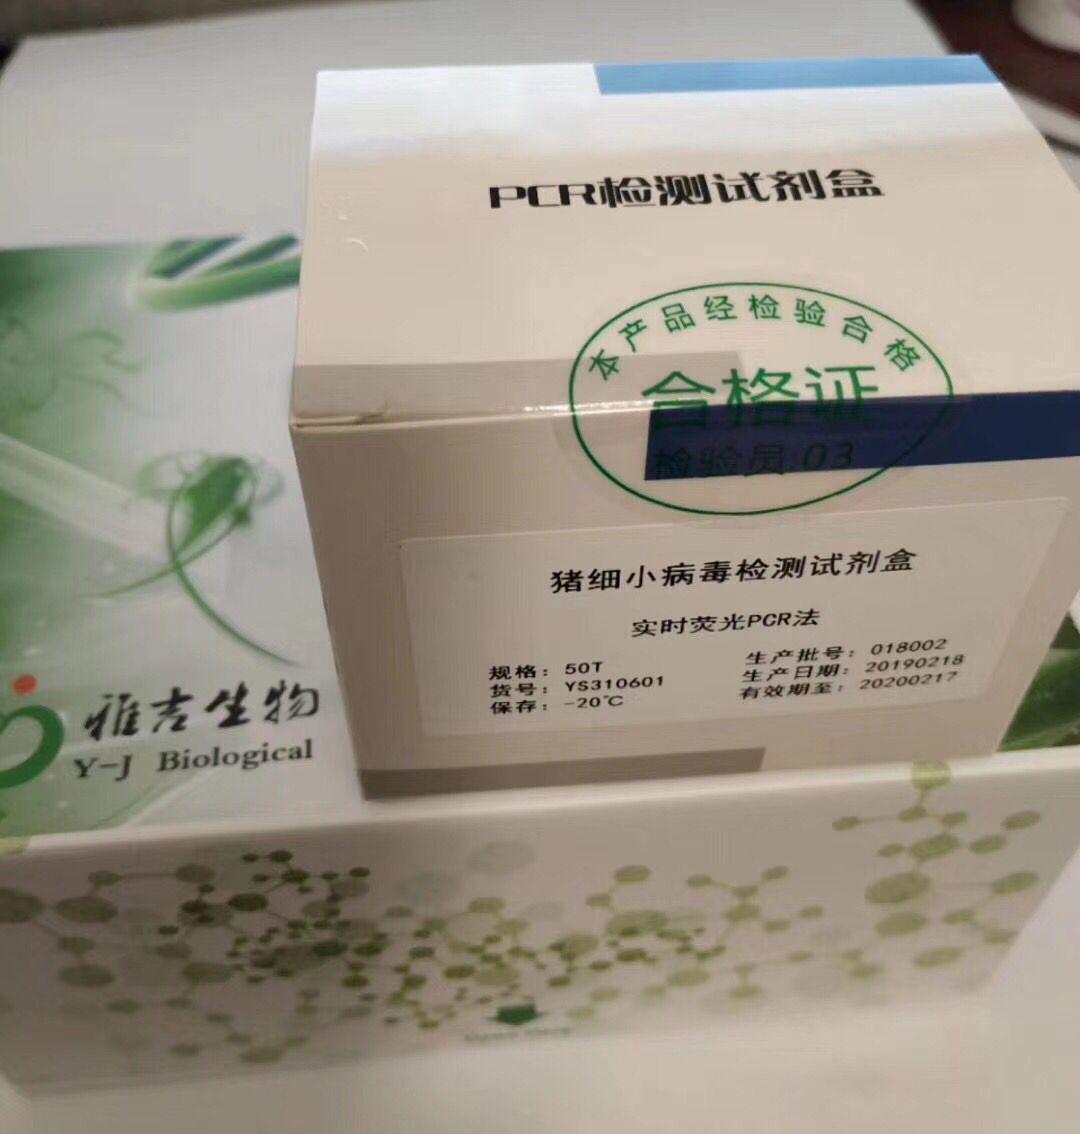 Listeria ivanovii伊氏李斯特菌PCR试剂盒13-6431050次